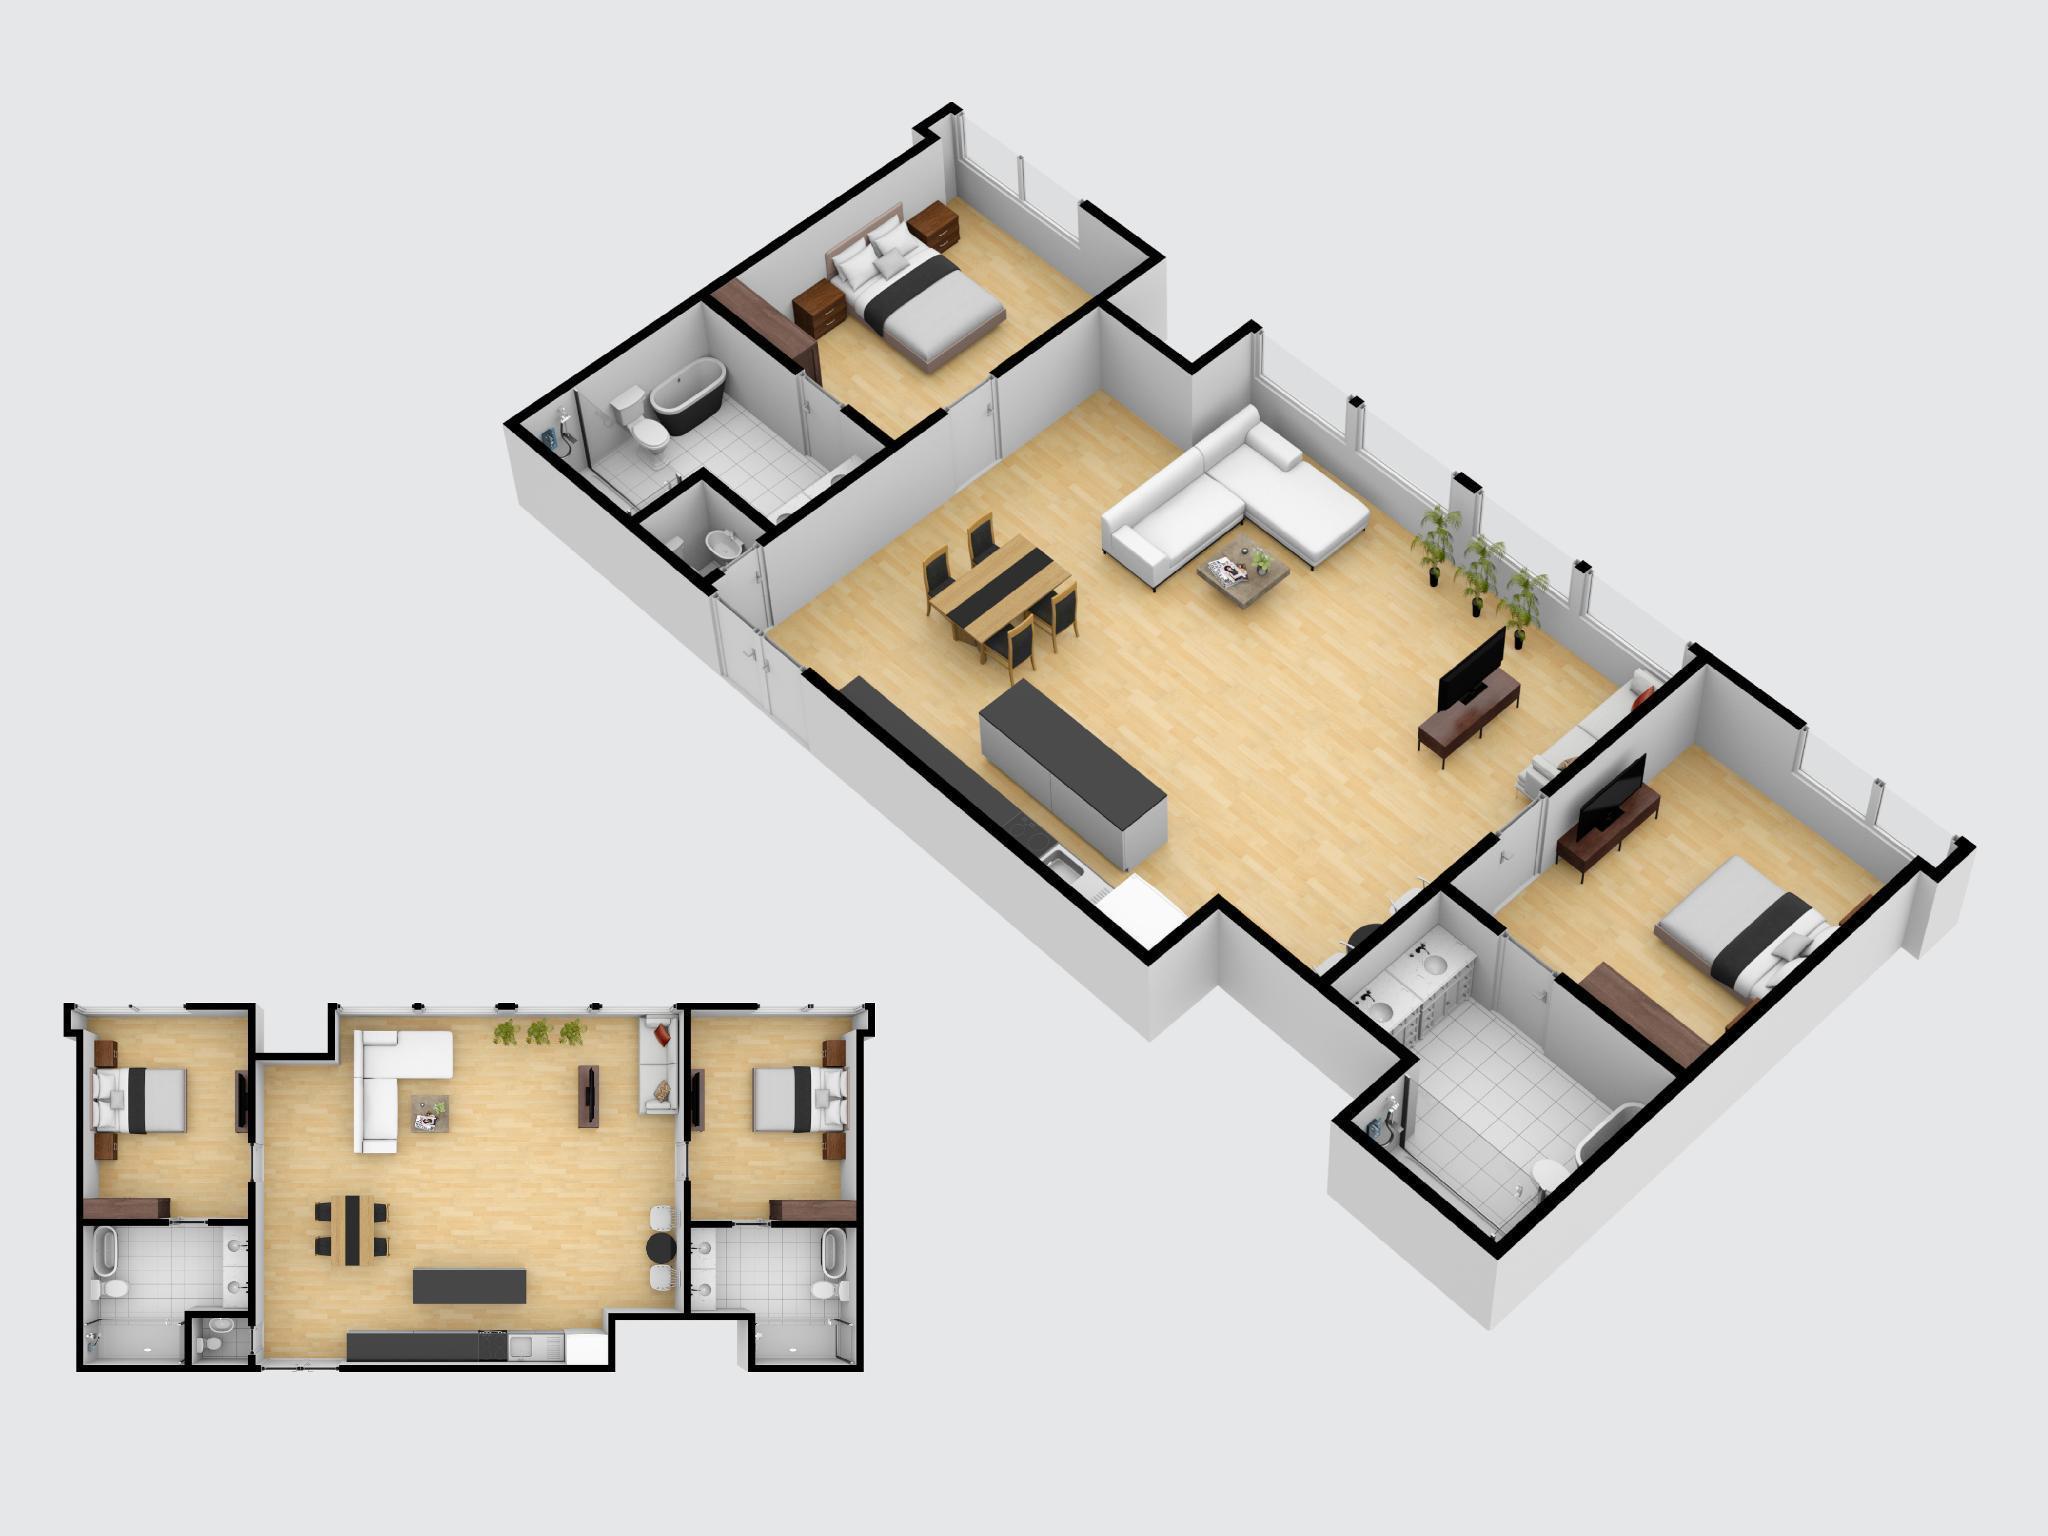 Clean and Huge 1 Bedroom private space อพาร์ตเมนต์ 2 ห้องนอน 2 ห้องน้ำส่วนตัว ขนาด 200 ตร.ม. – ป่าตอง